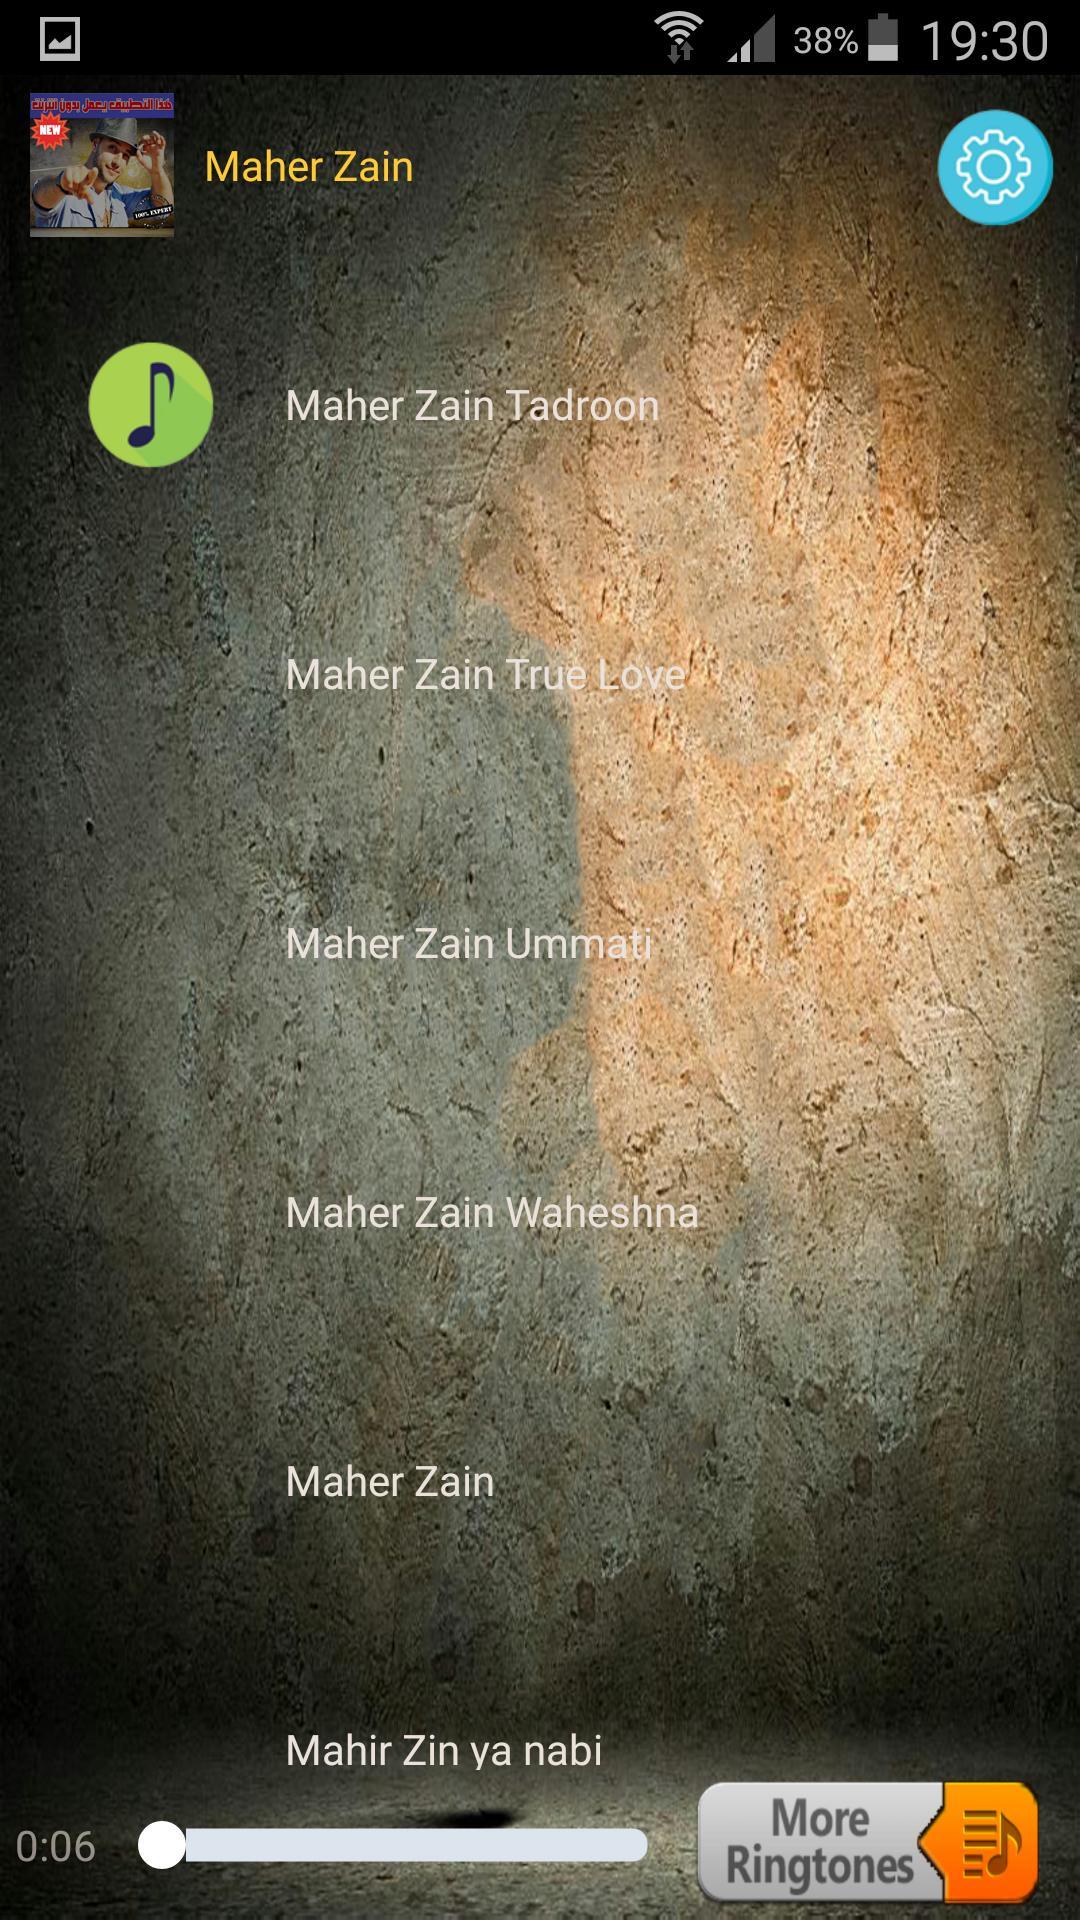 جديد ماهر زين بدون انترنت -Maher Zain 2018 for Android - APK